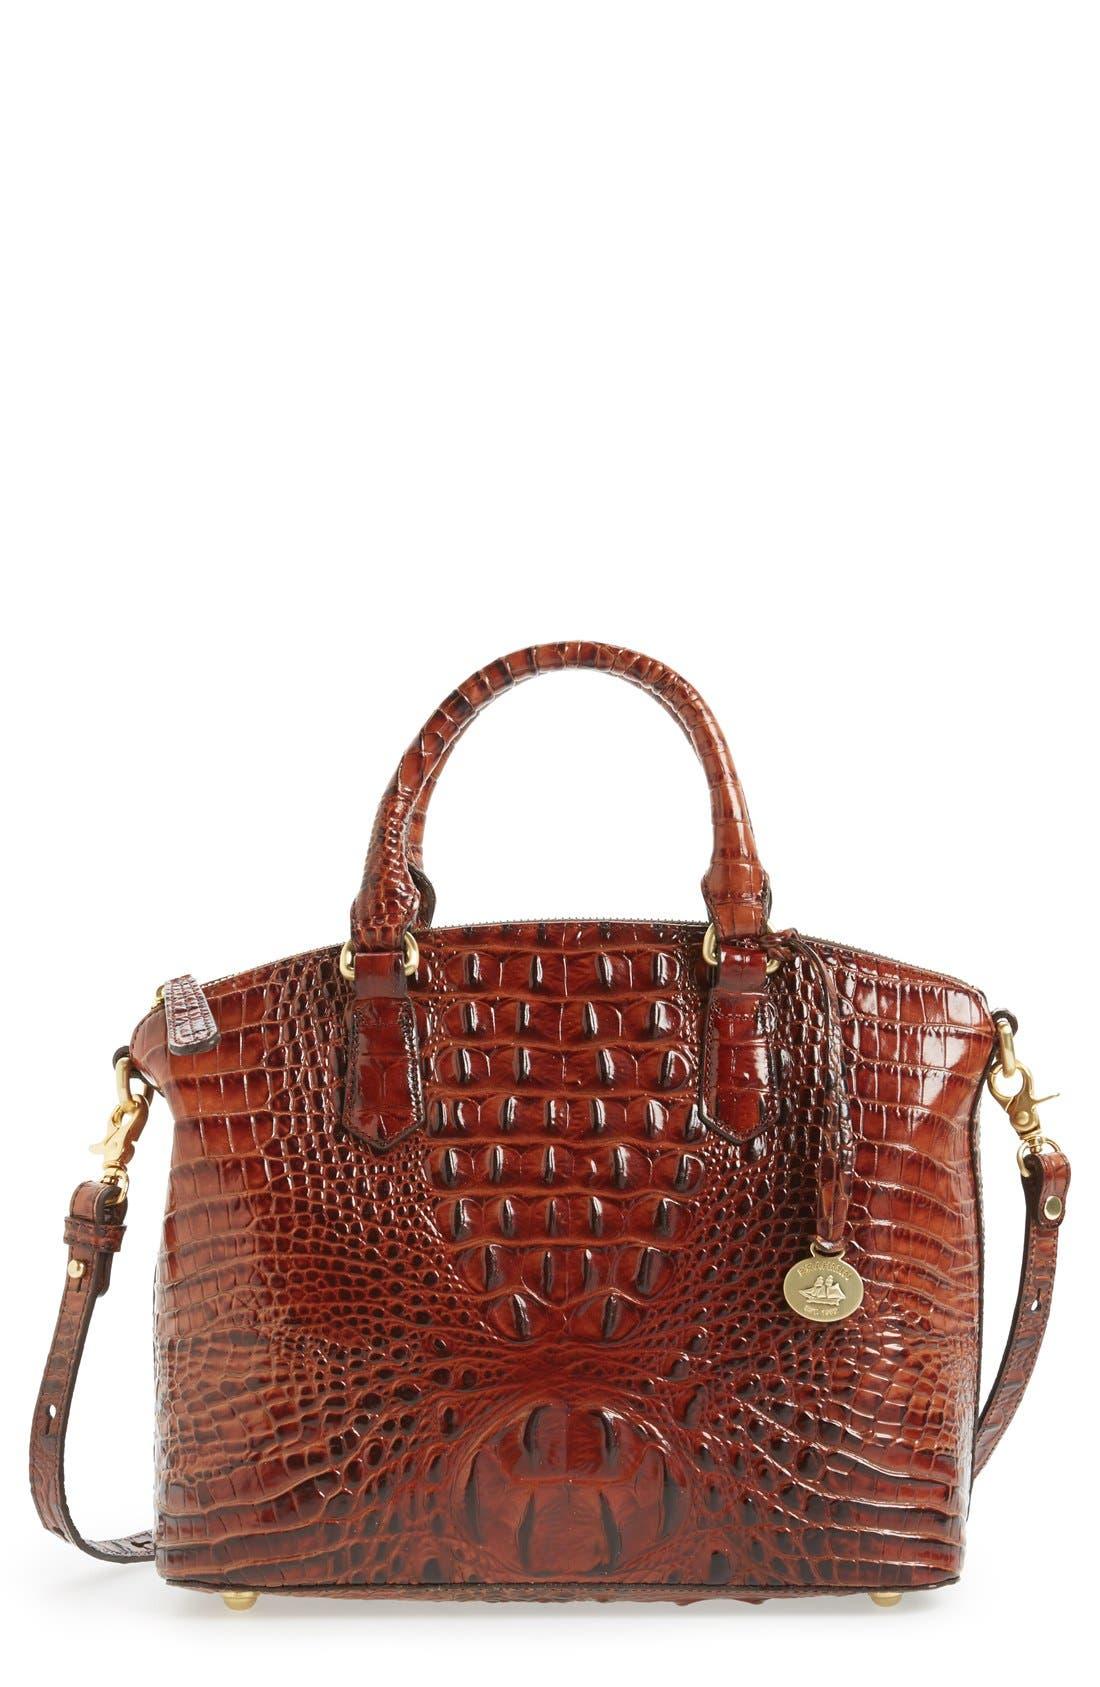 Alternate Image 1 Selected - Brahmin 'Medium Duxbury' Croc Embossed Leather Satchel